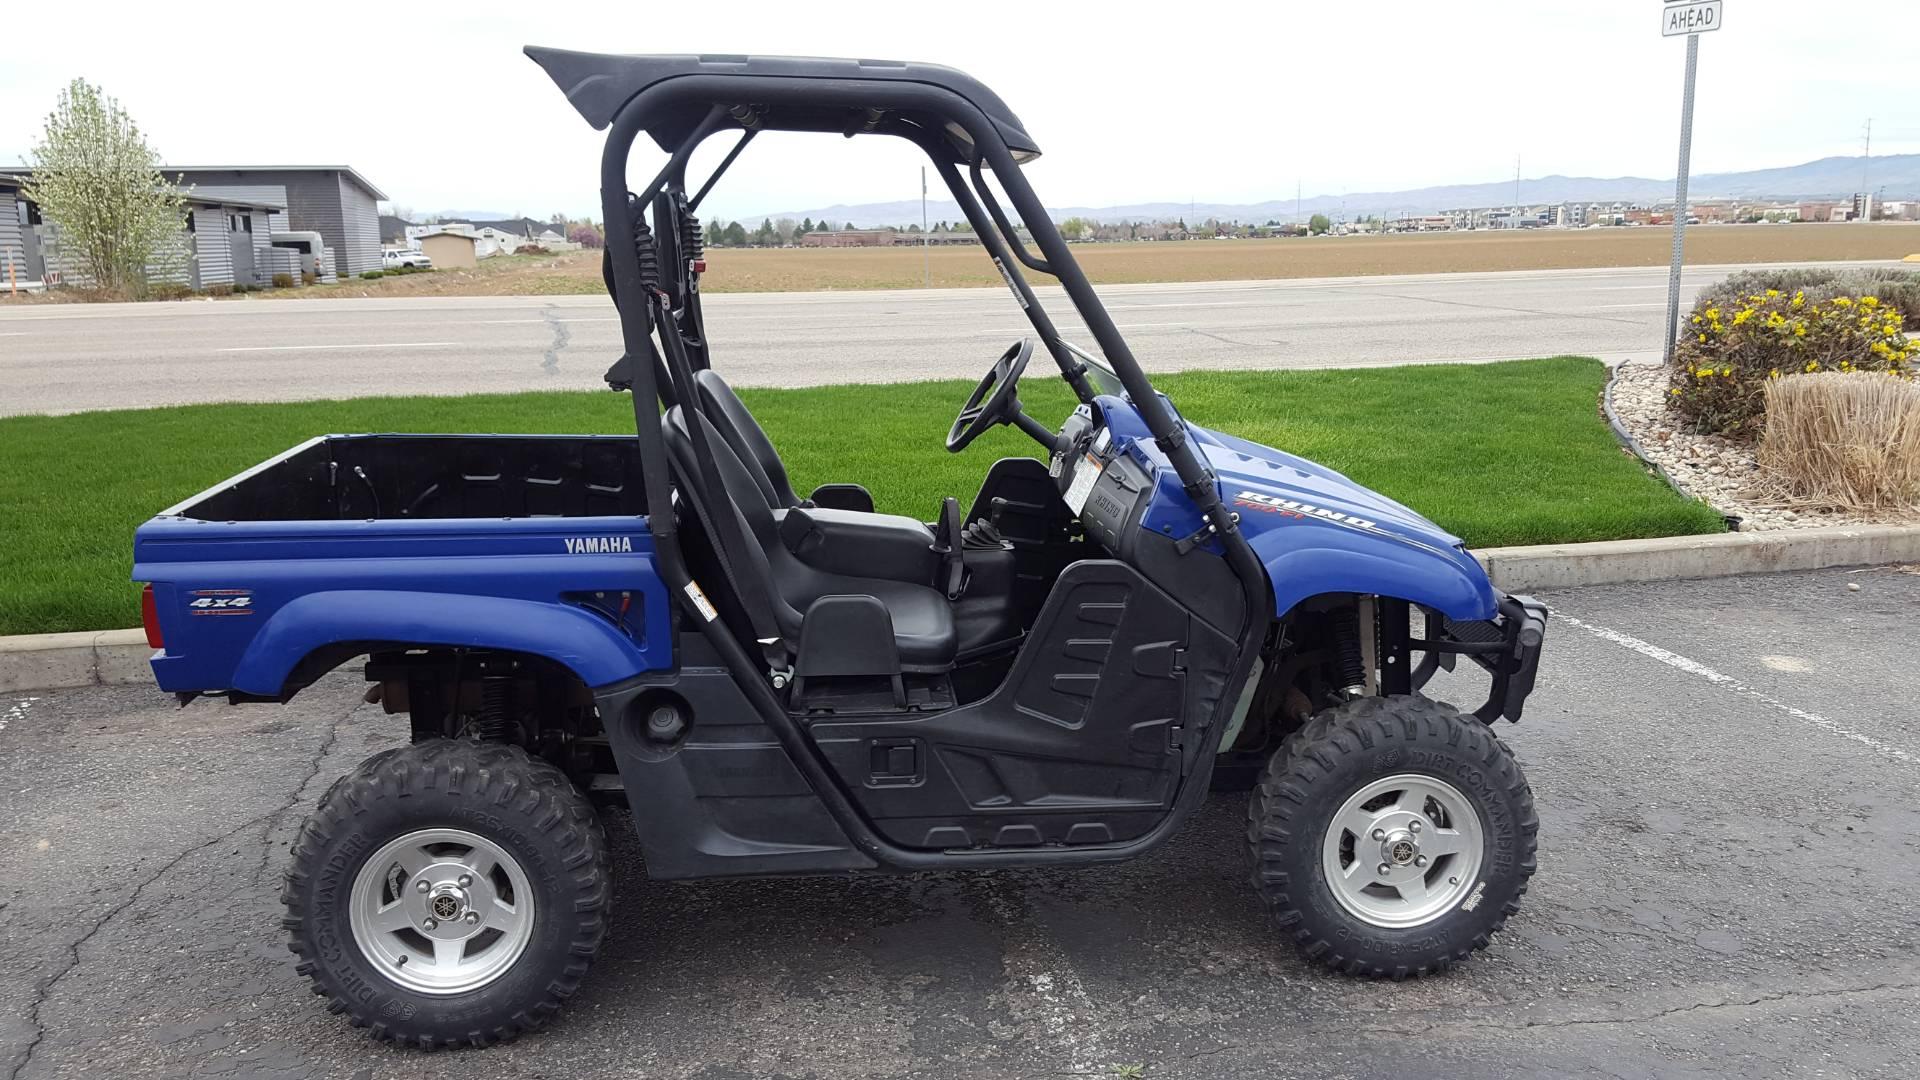 2012 Rhino 700 FI Auto. 4x4